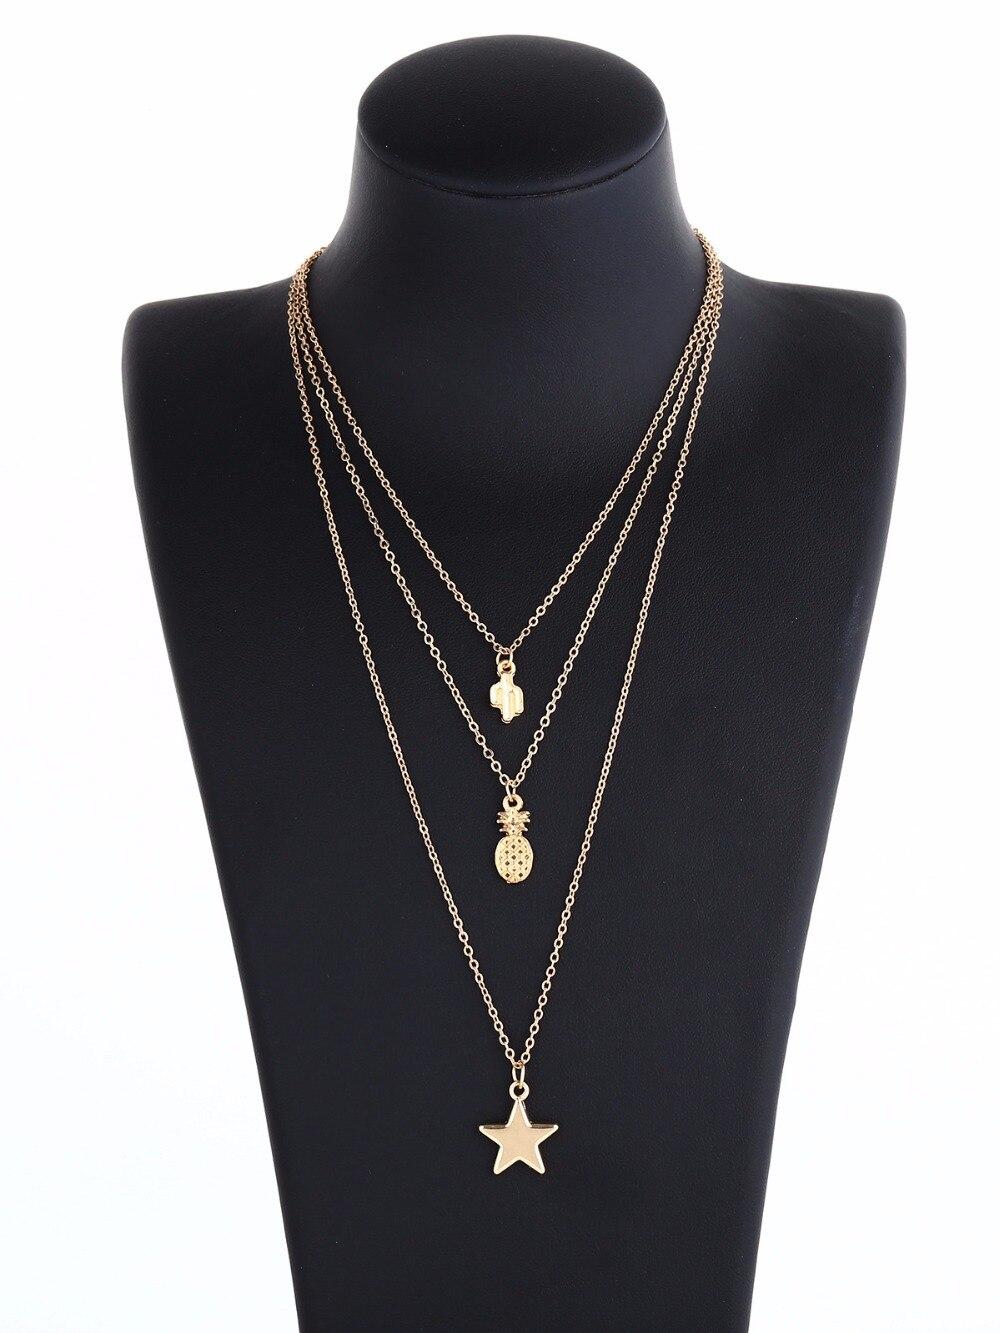 star cactus pineapple pendant neklace women choker necklace fashion jewelry collier femme chain necklaces & pendants